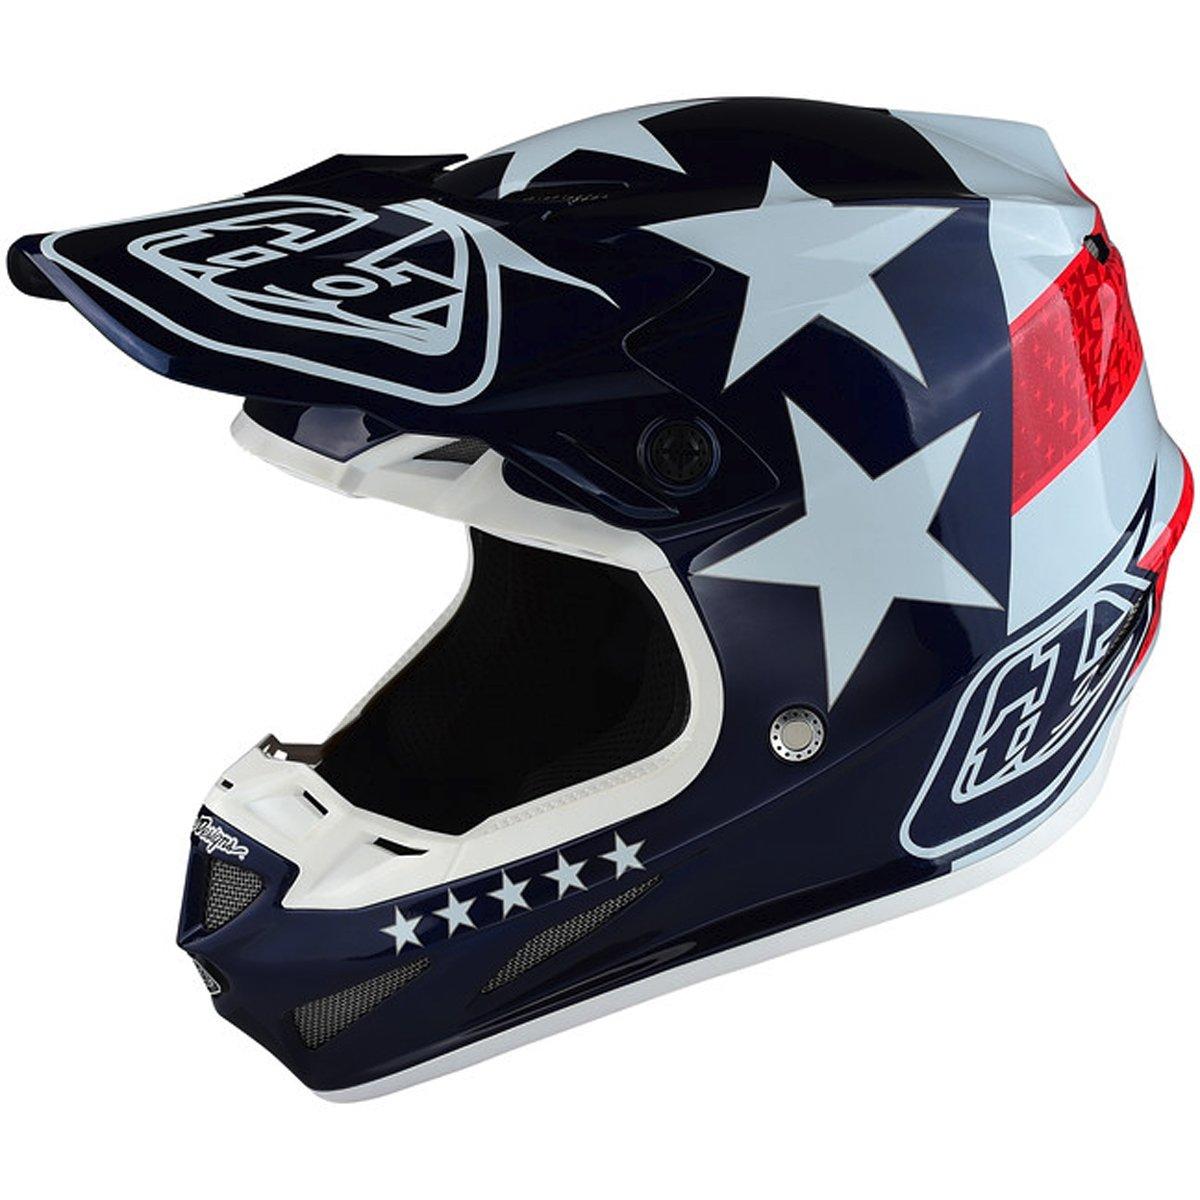 2017 Troy Lee Designs SE4 Composite Freedom Helmet